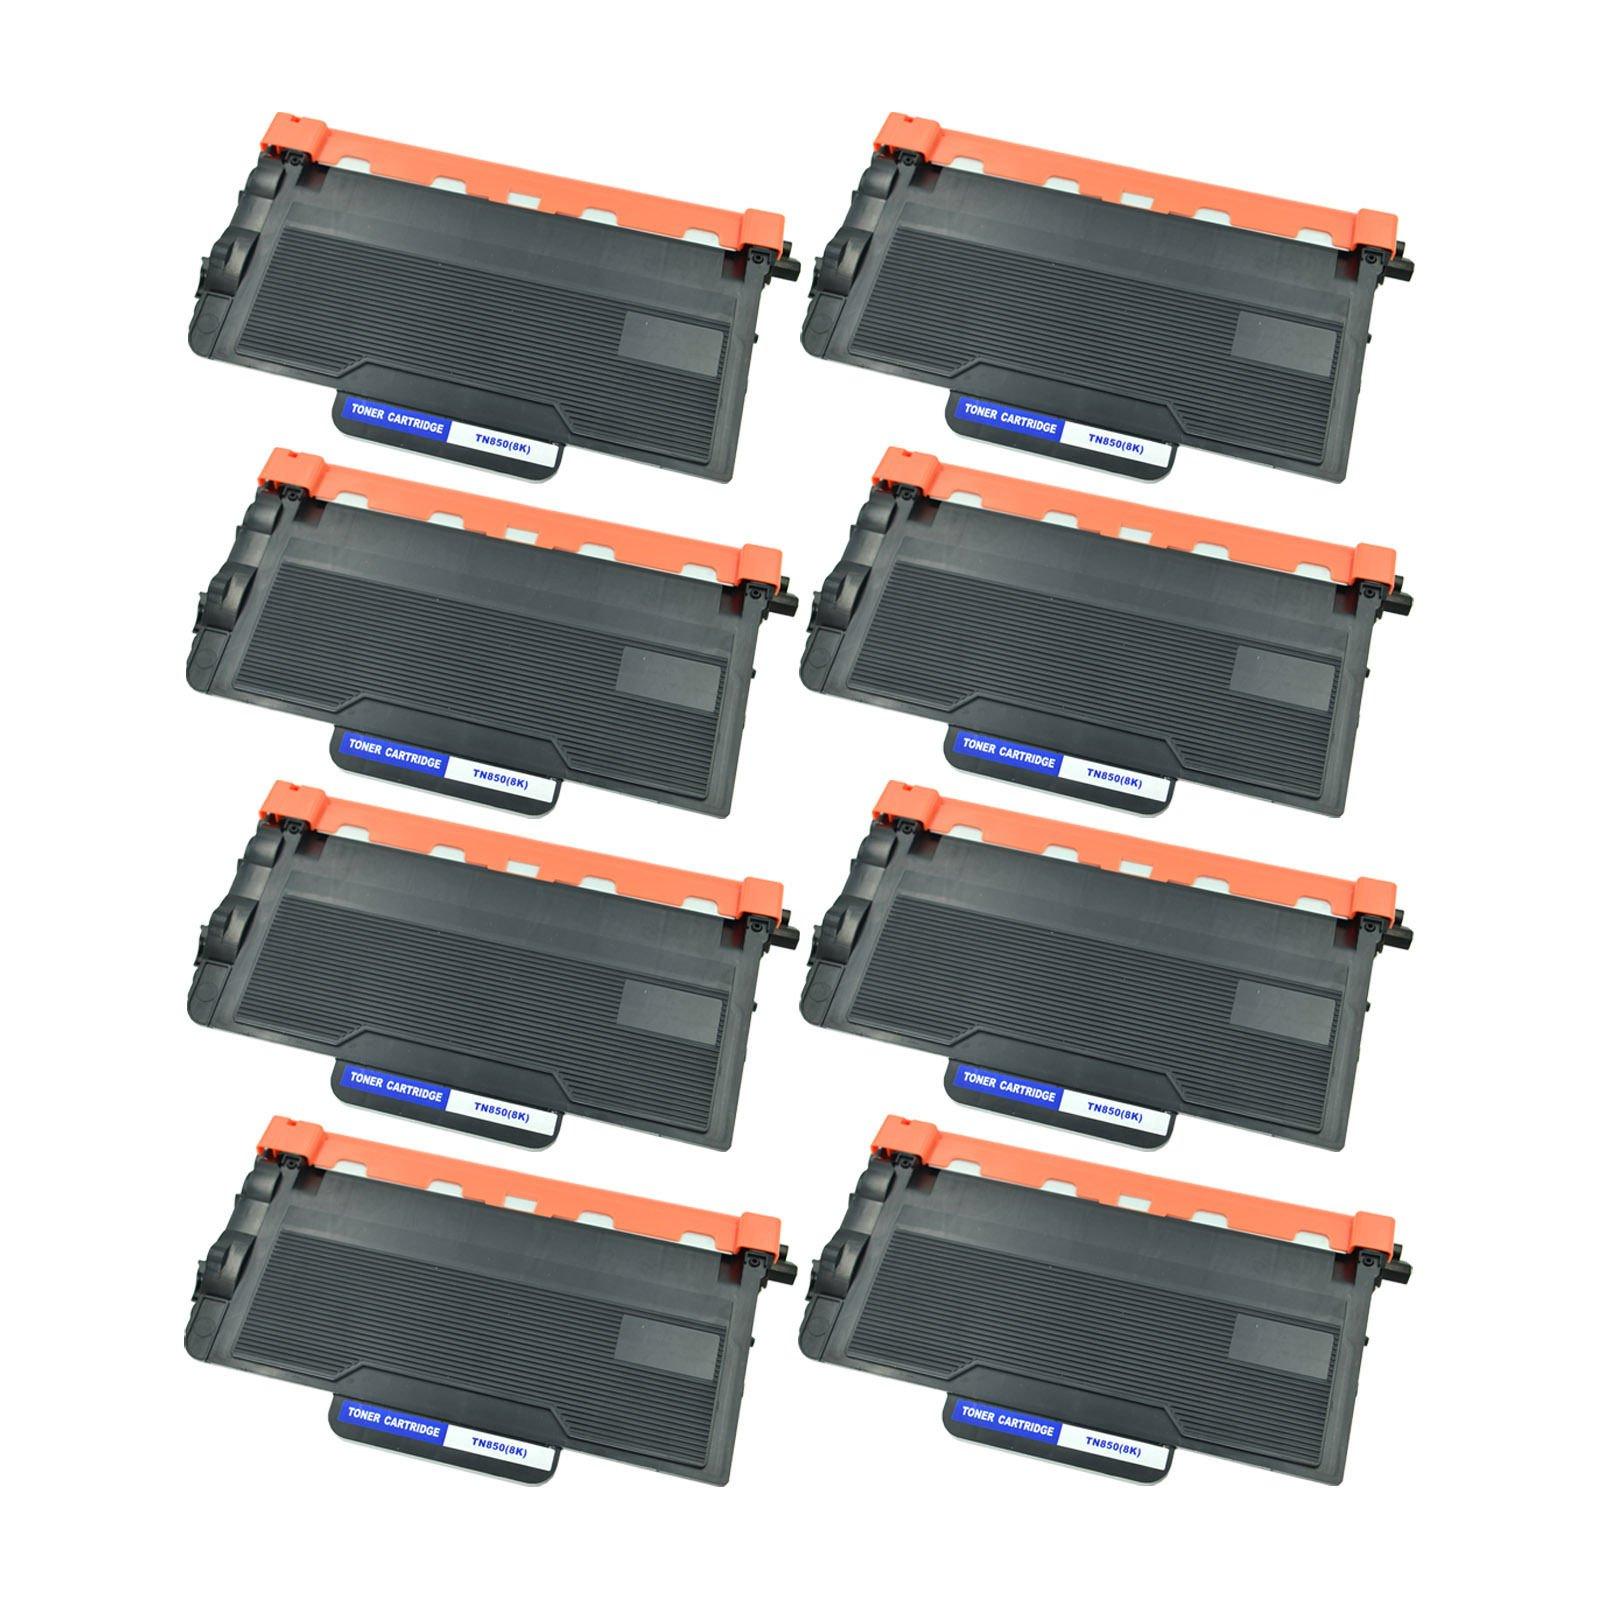 Purpplex New Compatible TN850 Laser Toner Cartridge for Brother MFC-L5900DW HL-L6300DW DCP-L5650DN Printers – 8 Black